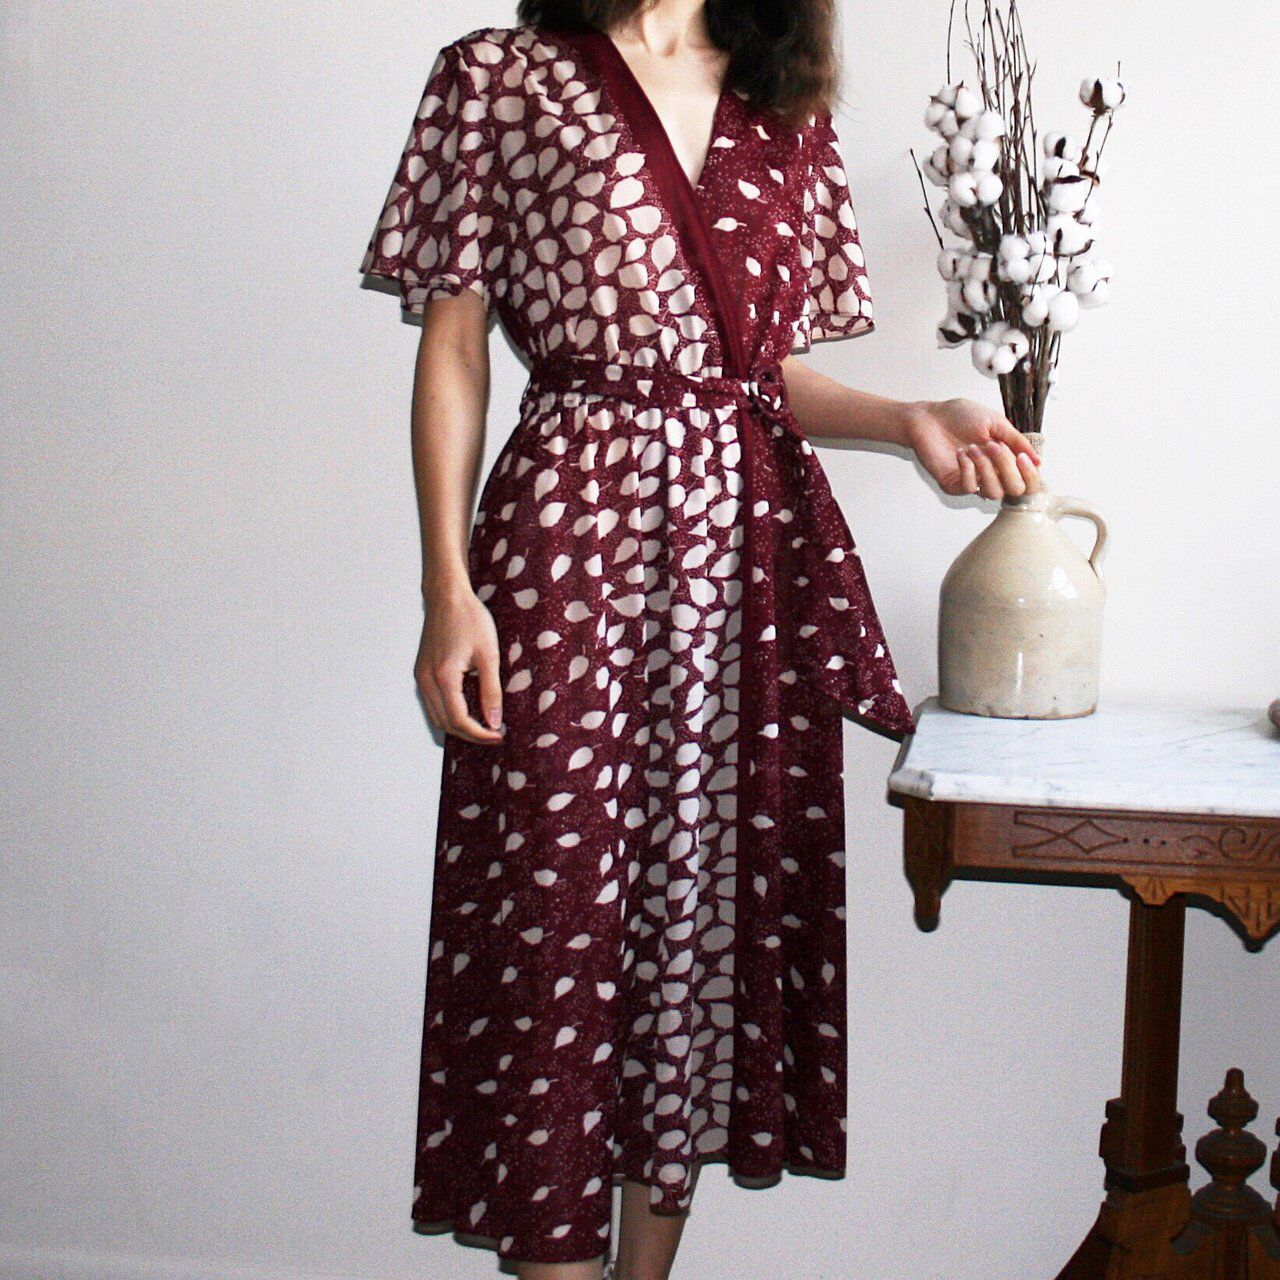 a347bf52b9 Listed on Depop by suualk | style | Depop, Fashion, Short sleeve dresses